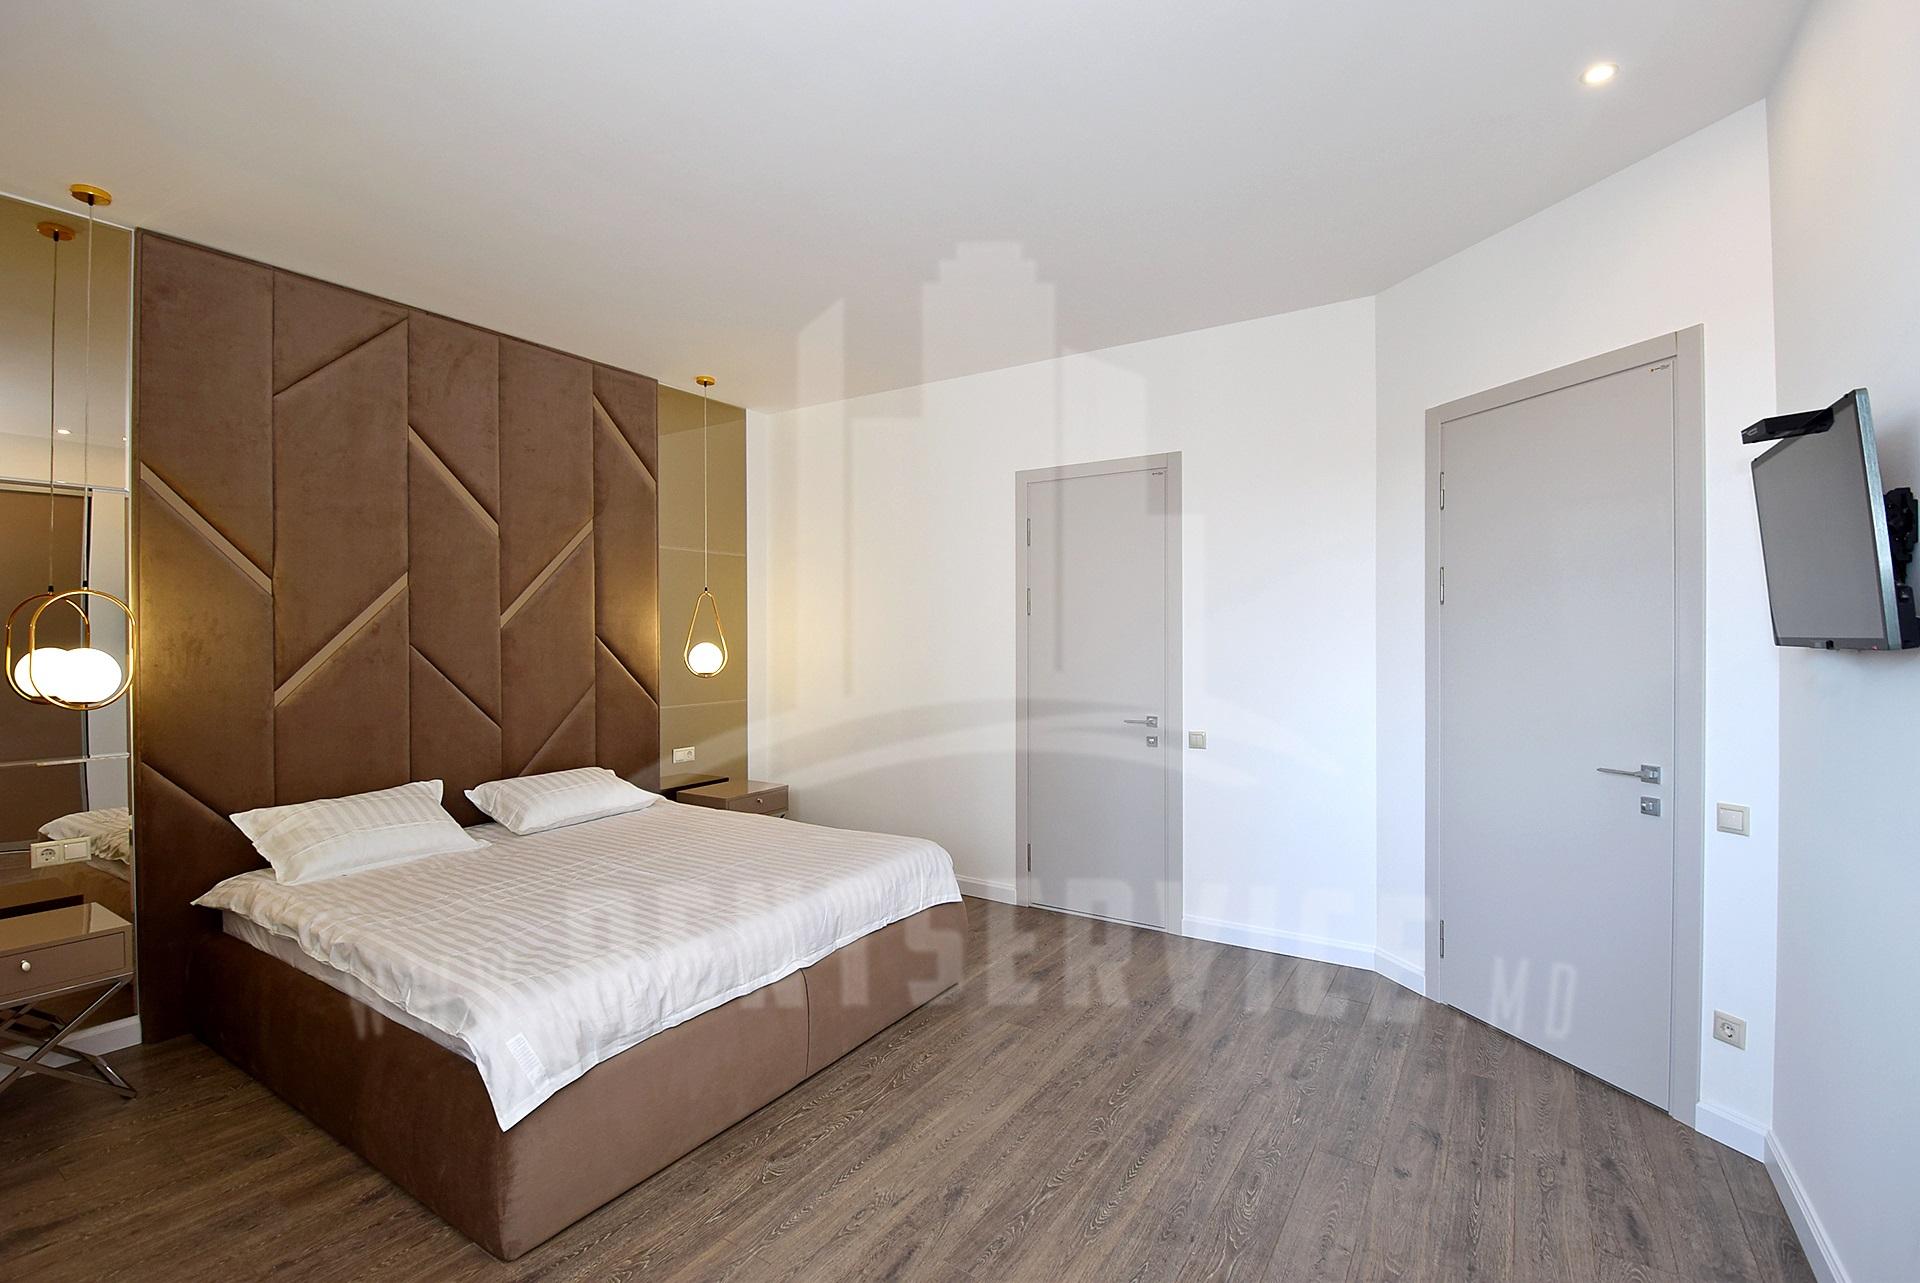 285_apartment_14.JPG